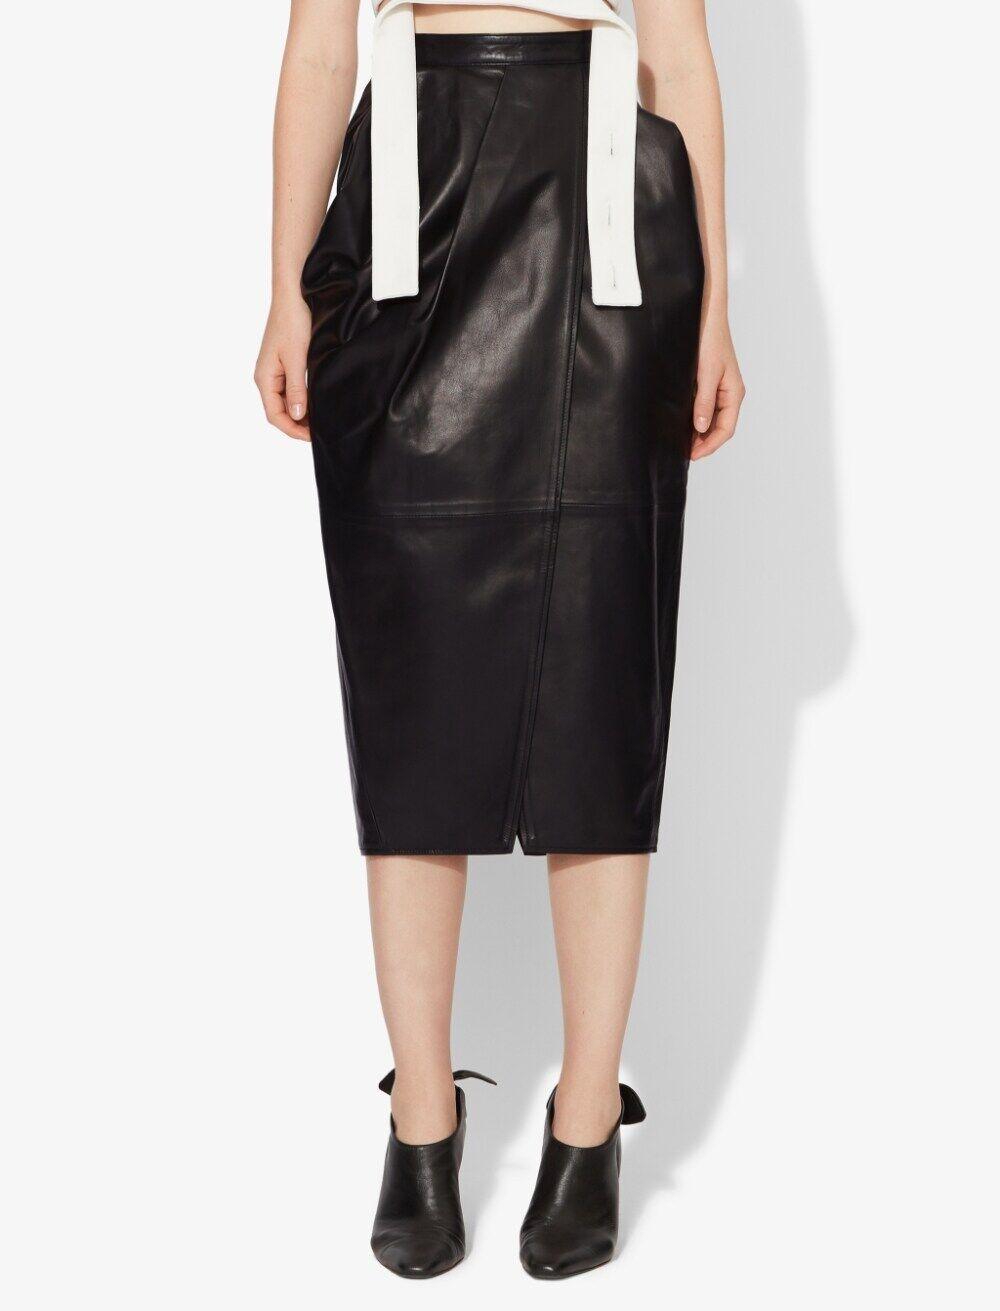 Proenza Schouler Leather Tulip Skirt black 0